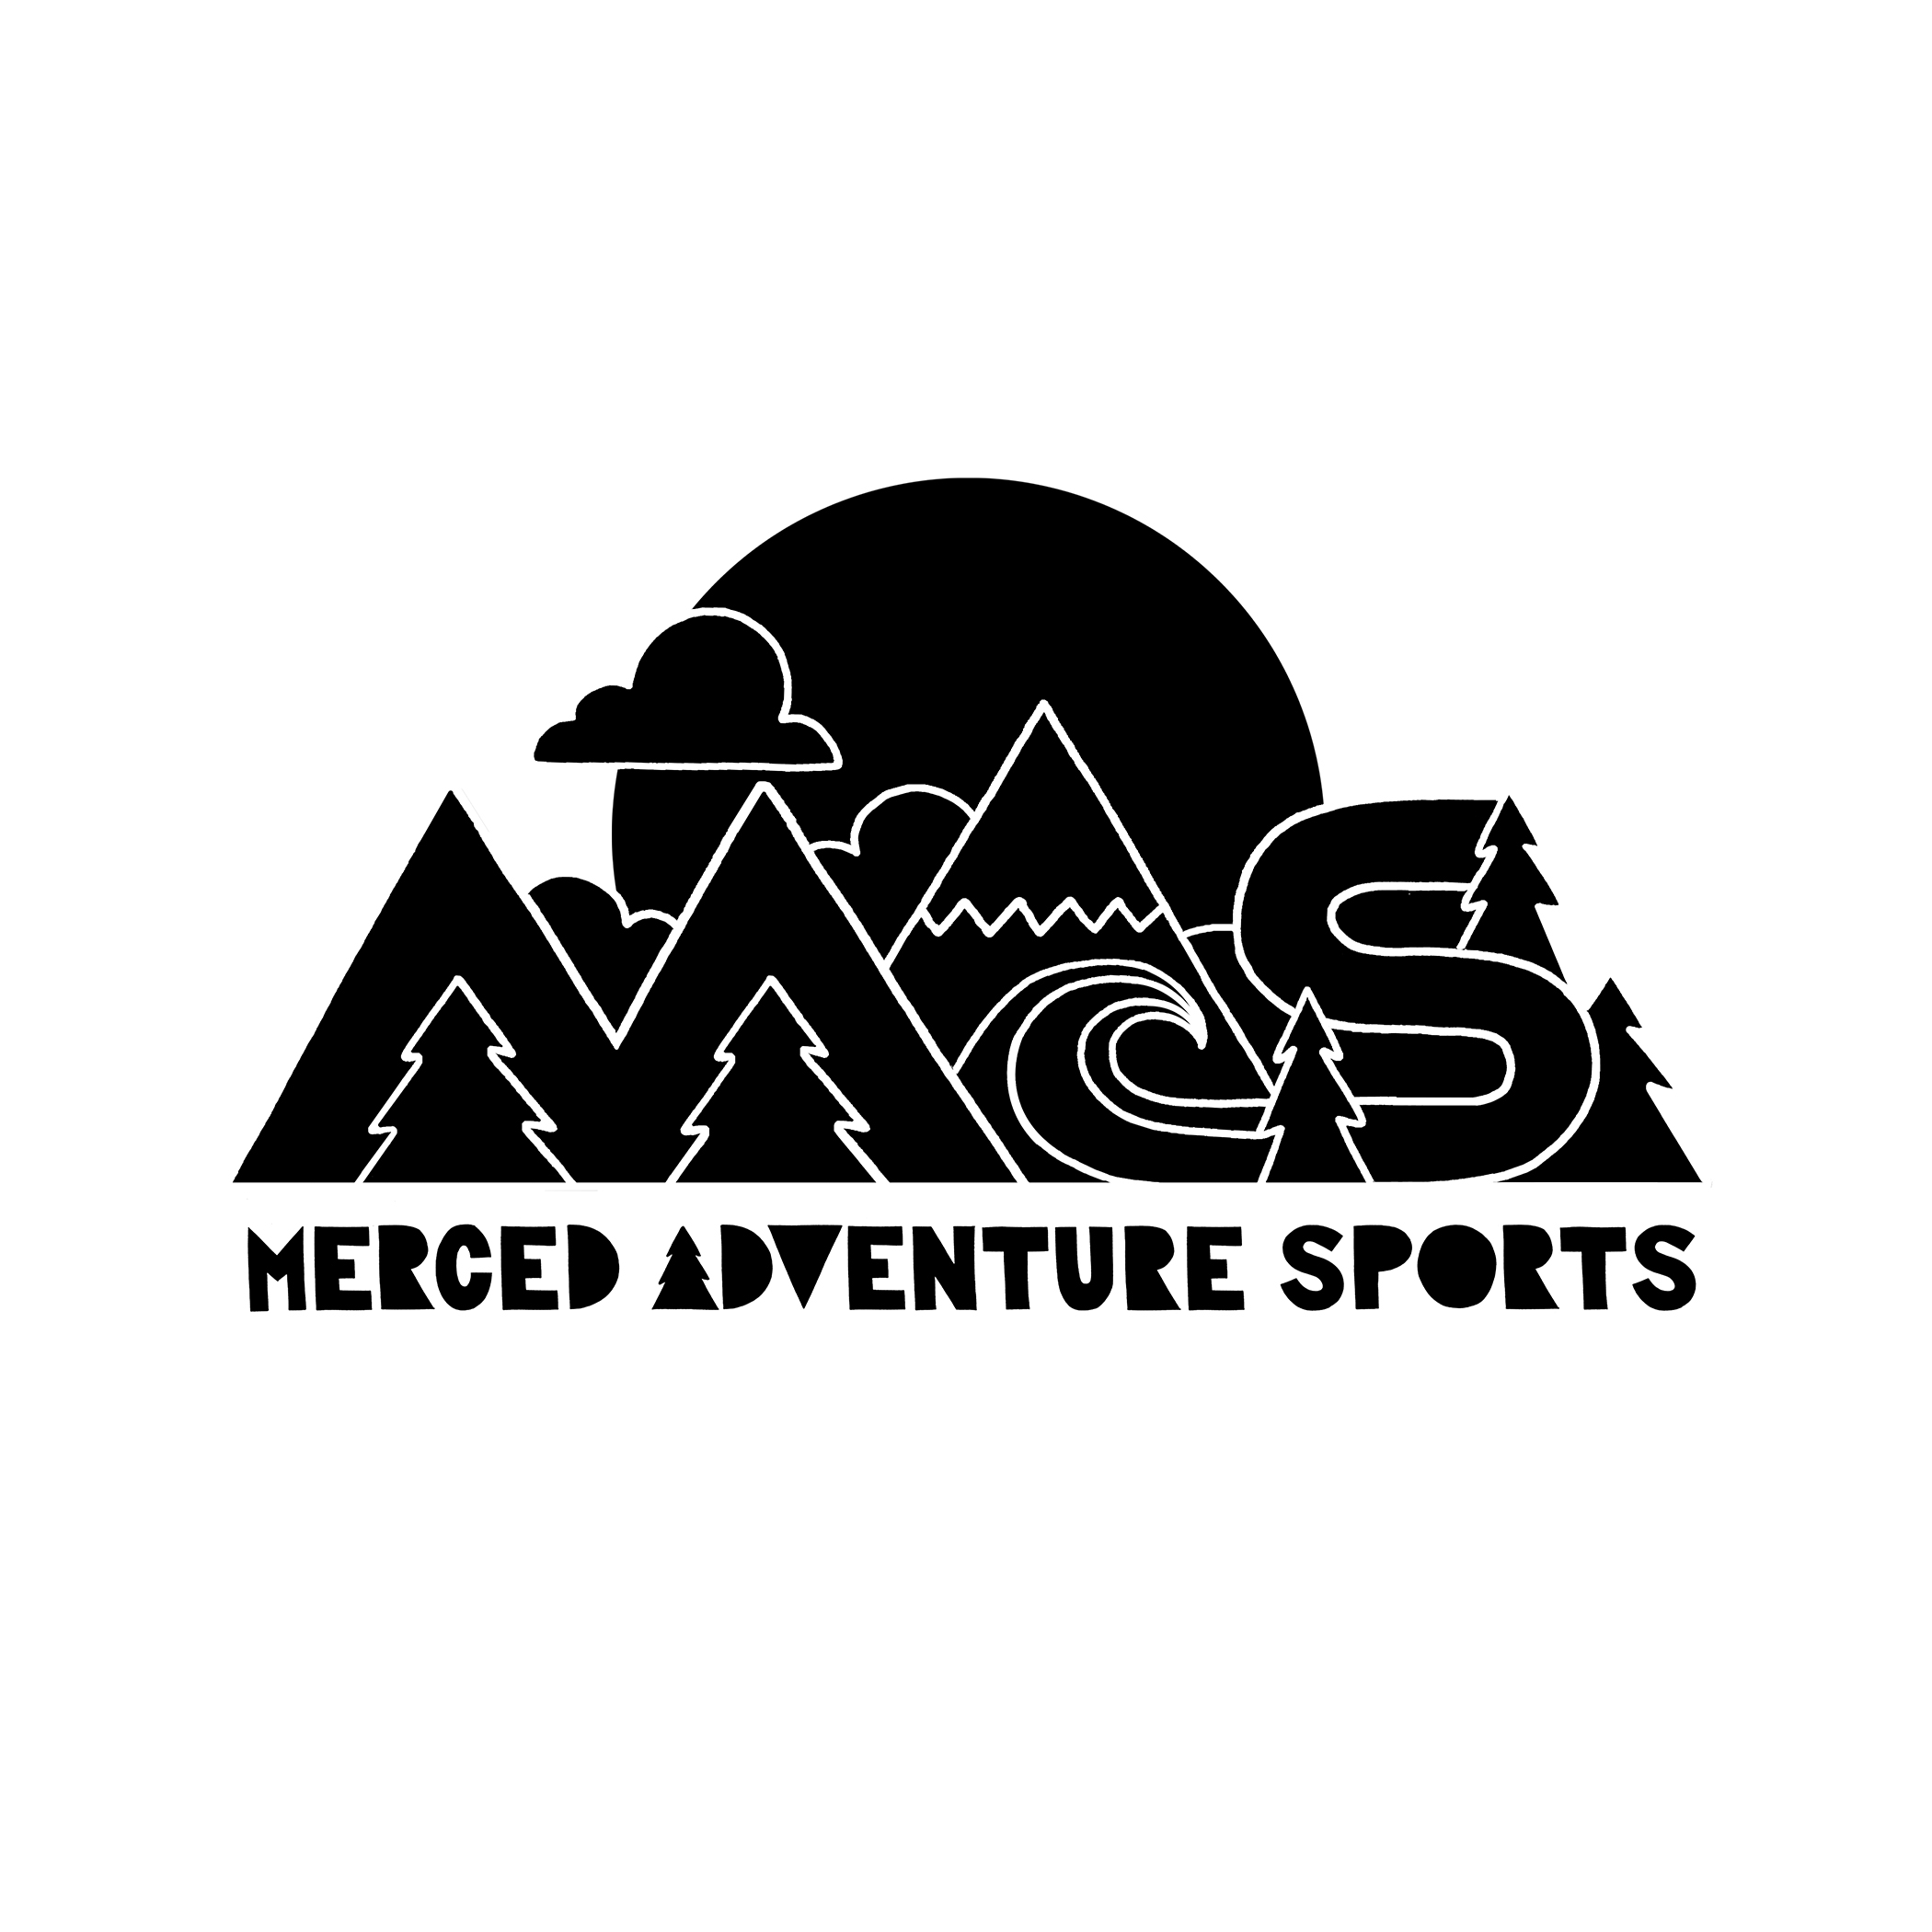 Merced Adventure Sports.